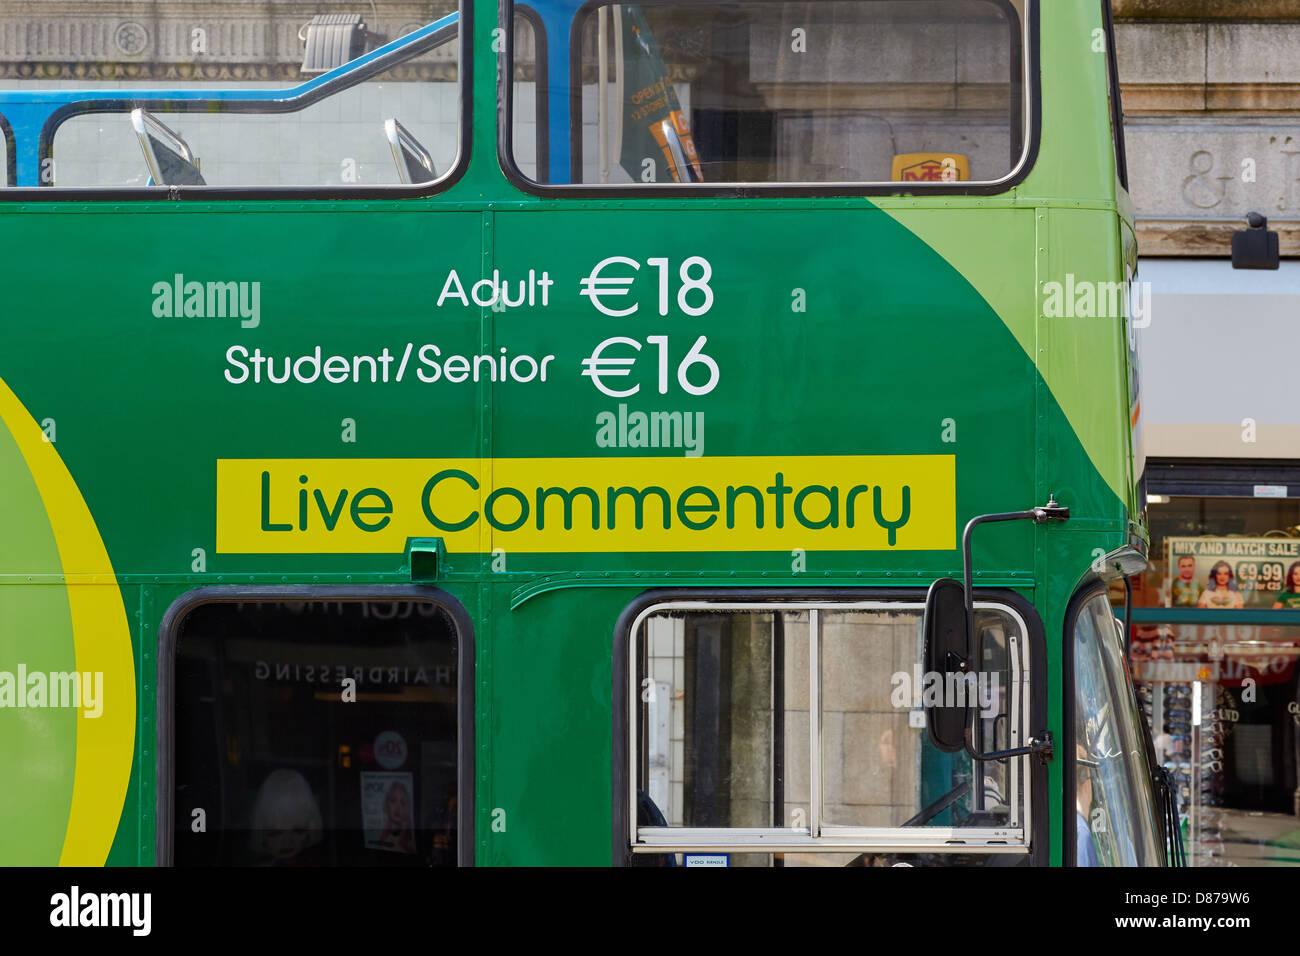 Dublin bus tour – Green bus – Hop on Hop off. O'Connell Street, Dublin, Republic of Ireland - Stock Image